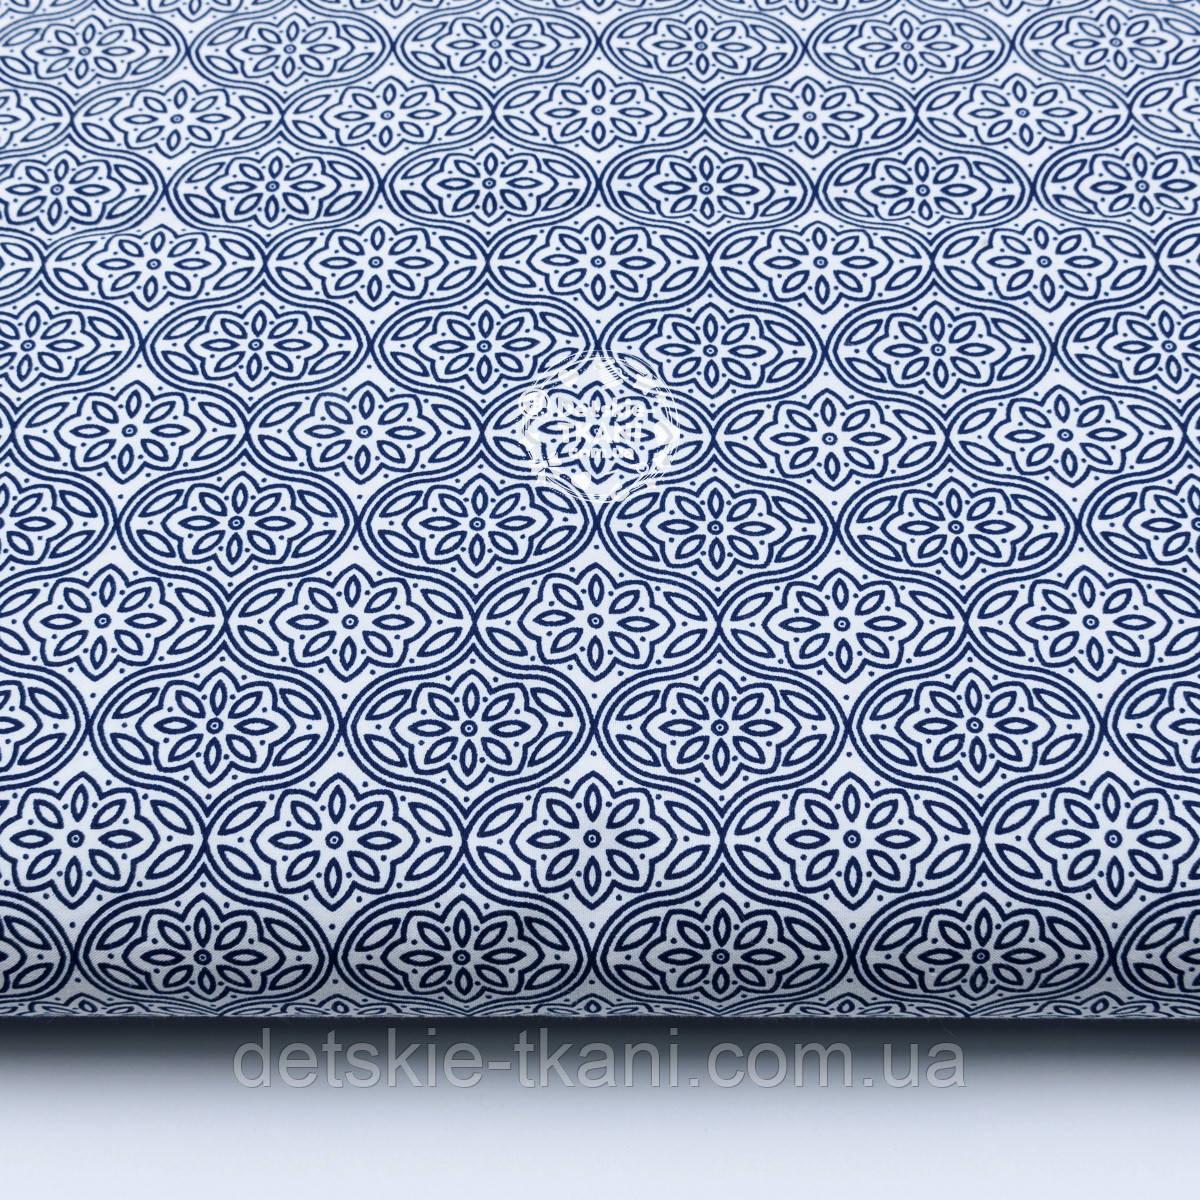 Ткань хлопковая Mist с синим узором на белом фоне ( № 374м)